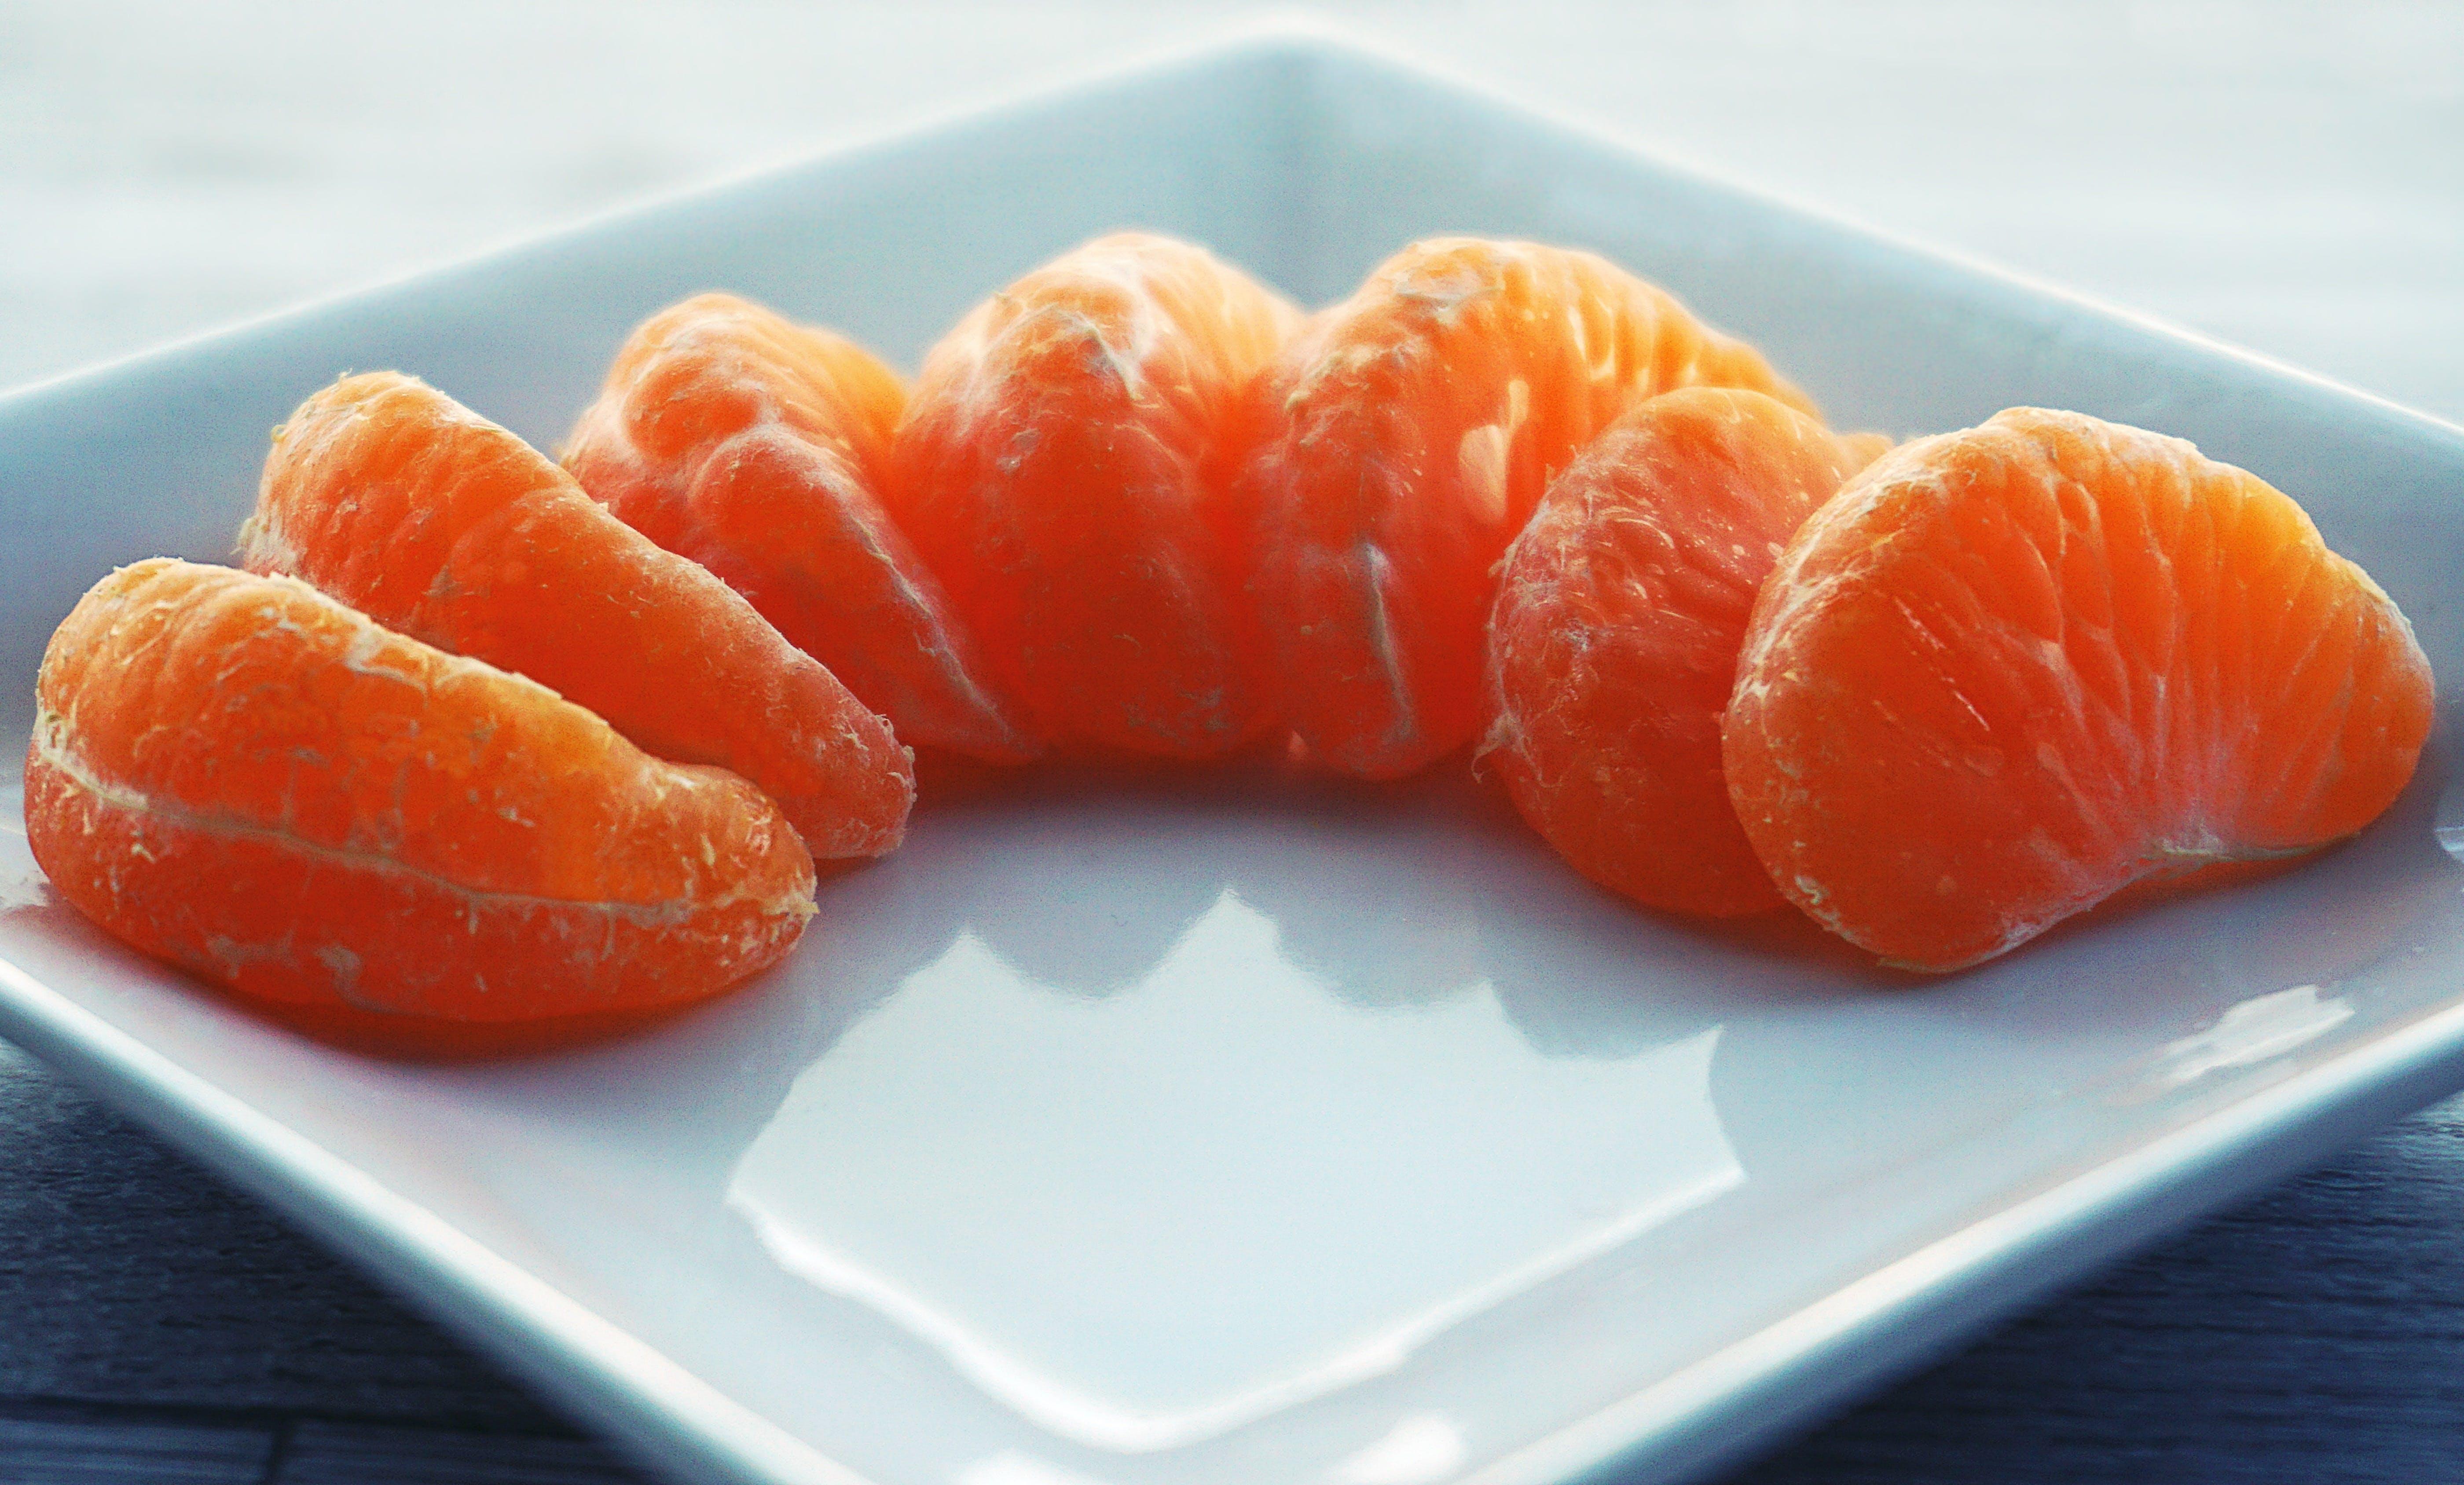 Orange Fruit on White Ceramic Saucer